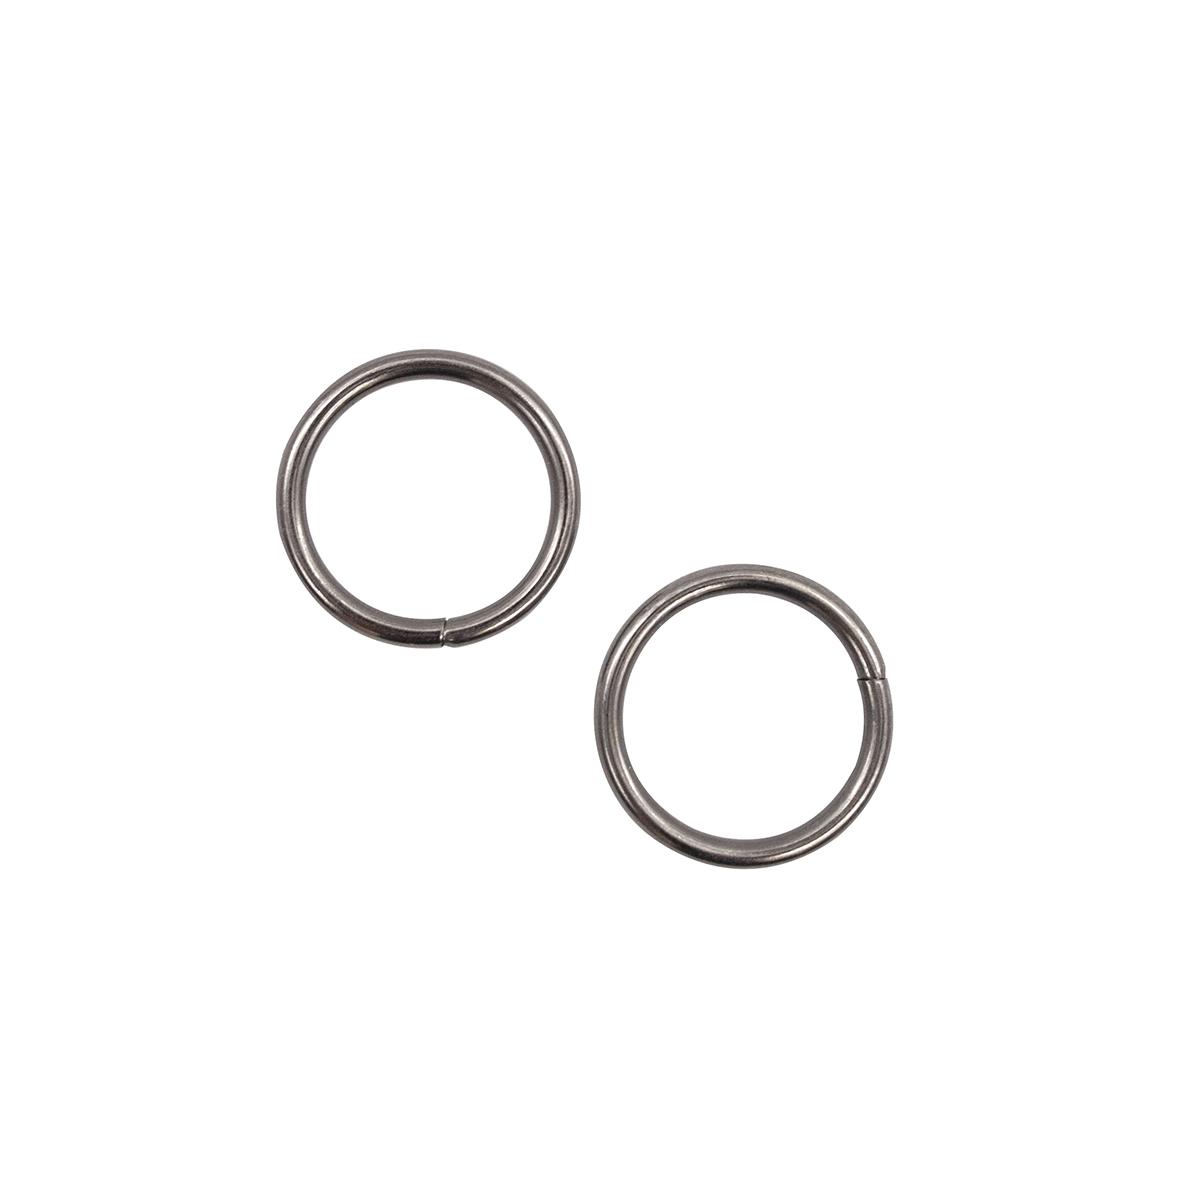 816B-002 Кольцо разъемное, 20*2,5 мм, упак./2 шт., Hobby&Pro